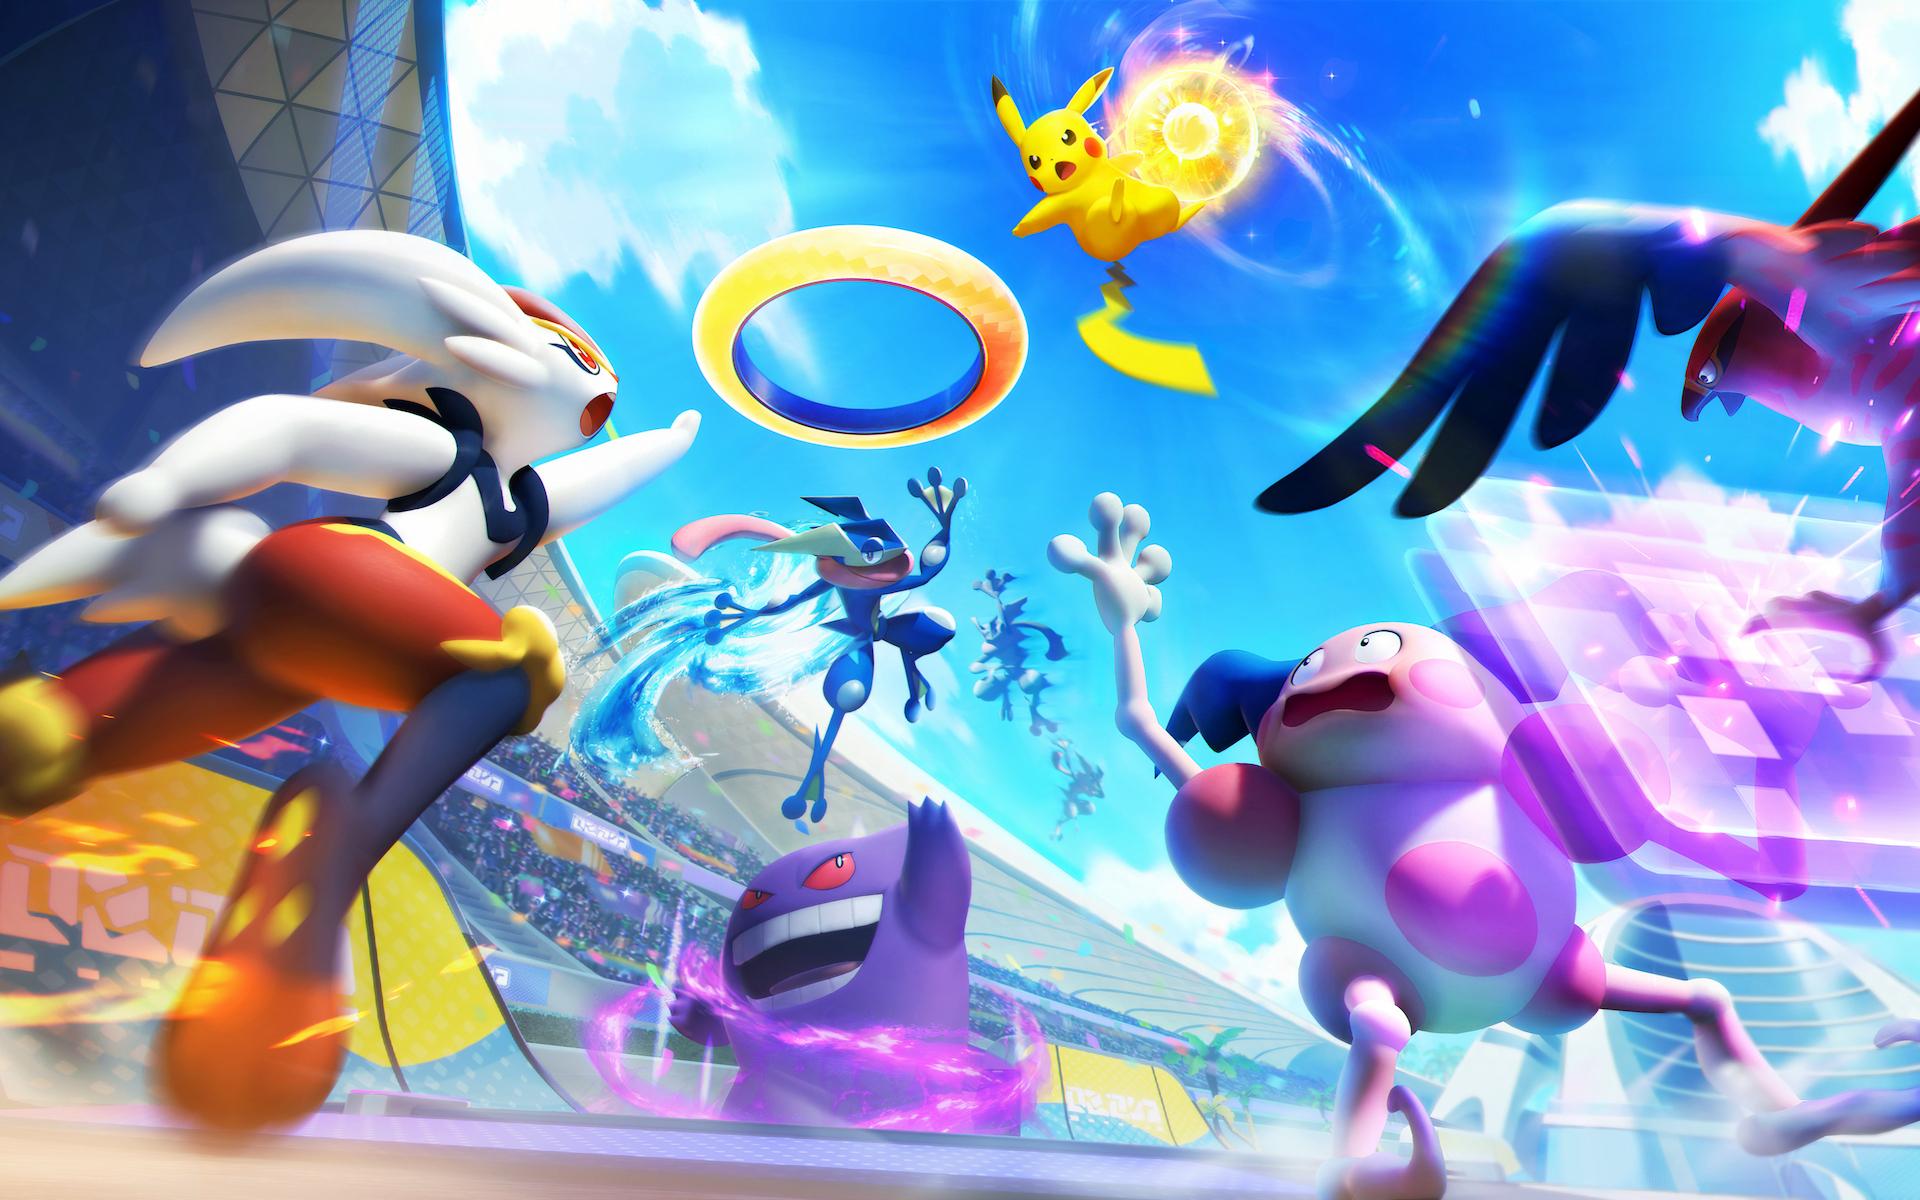 Artwork of various Pokémon battling from Pokémon Unite